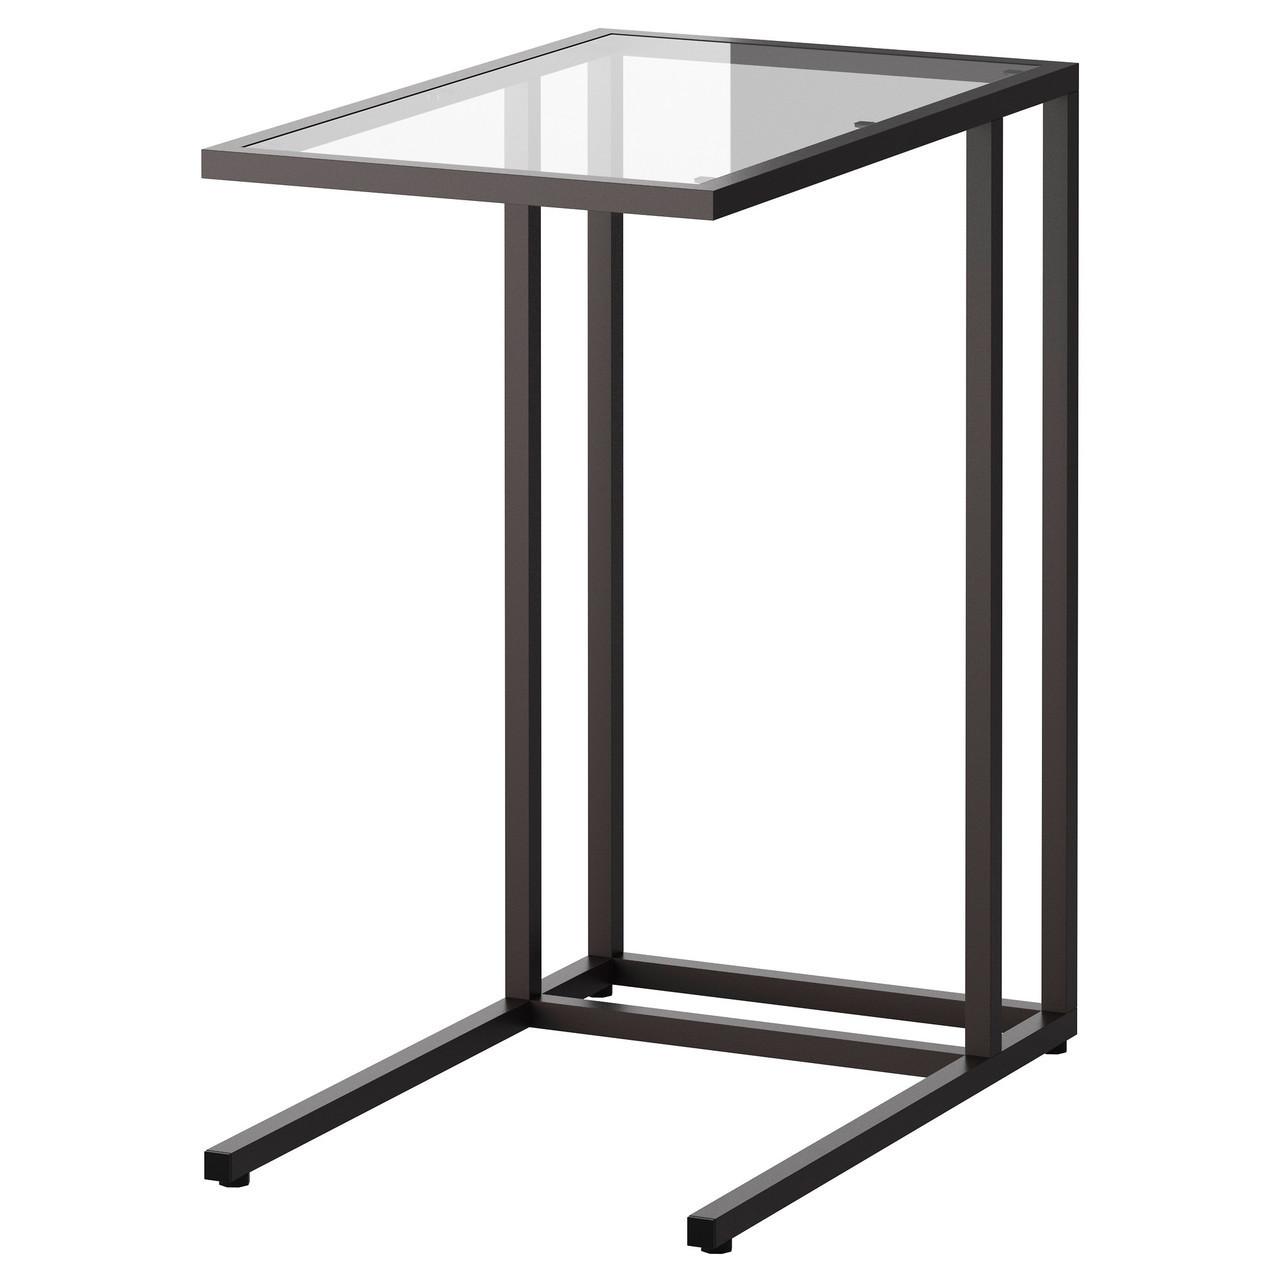 Подставка для ноутбука VITTSJÖ, черно-коричневый, стекло, IKEA, 002.502.49